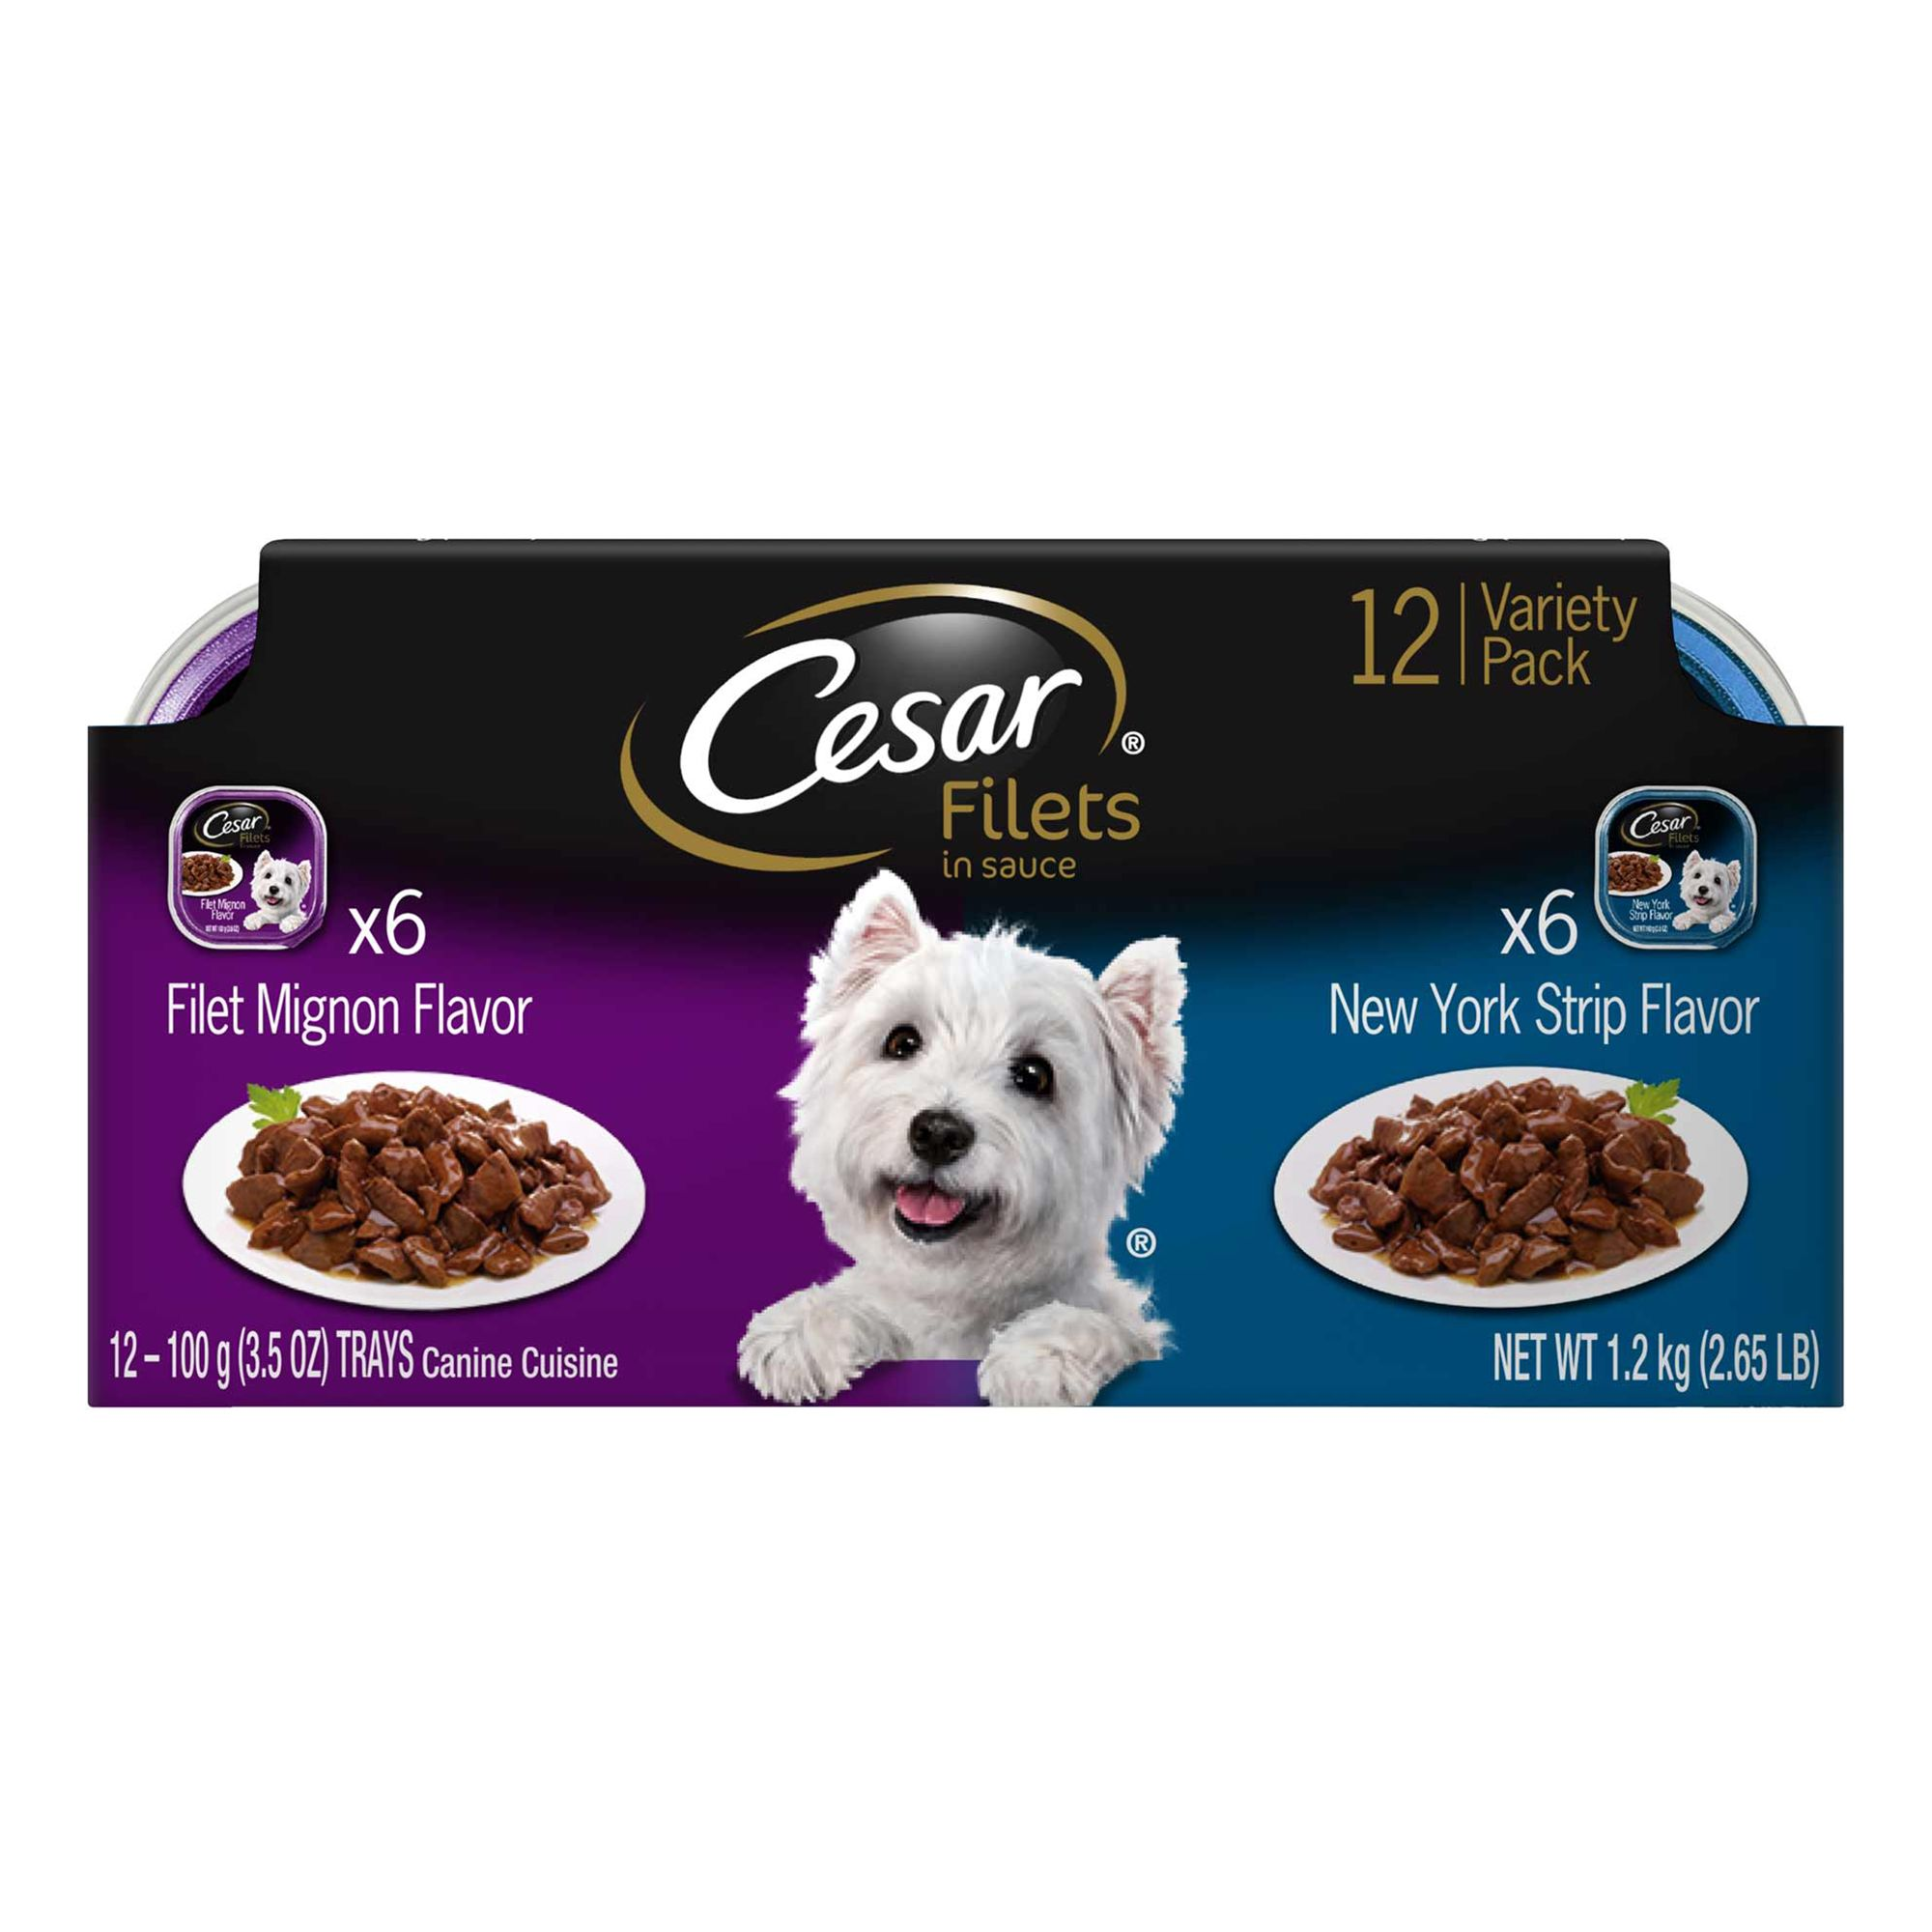 Cesar Canine Cuisine Gourmet Filets Dog Food 12 Pack Size 3.5 Oz